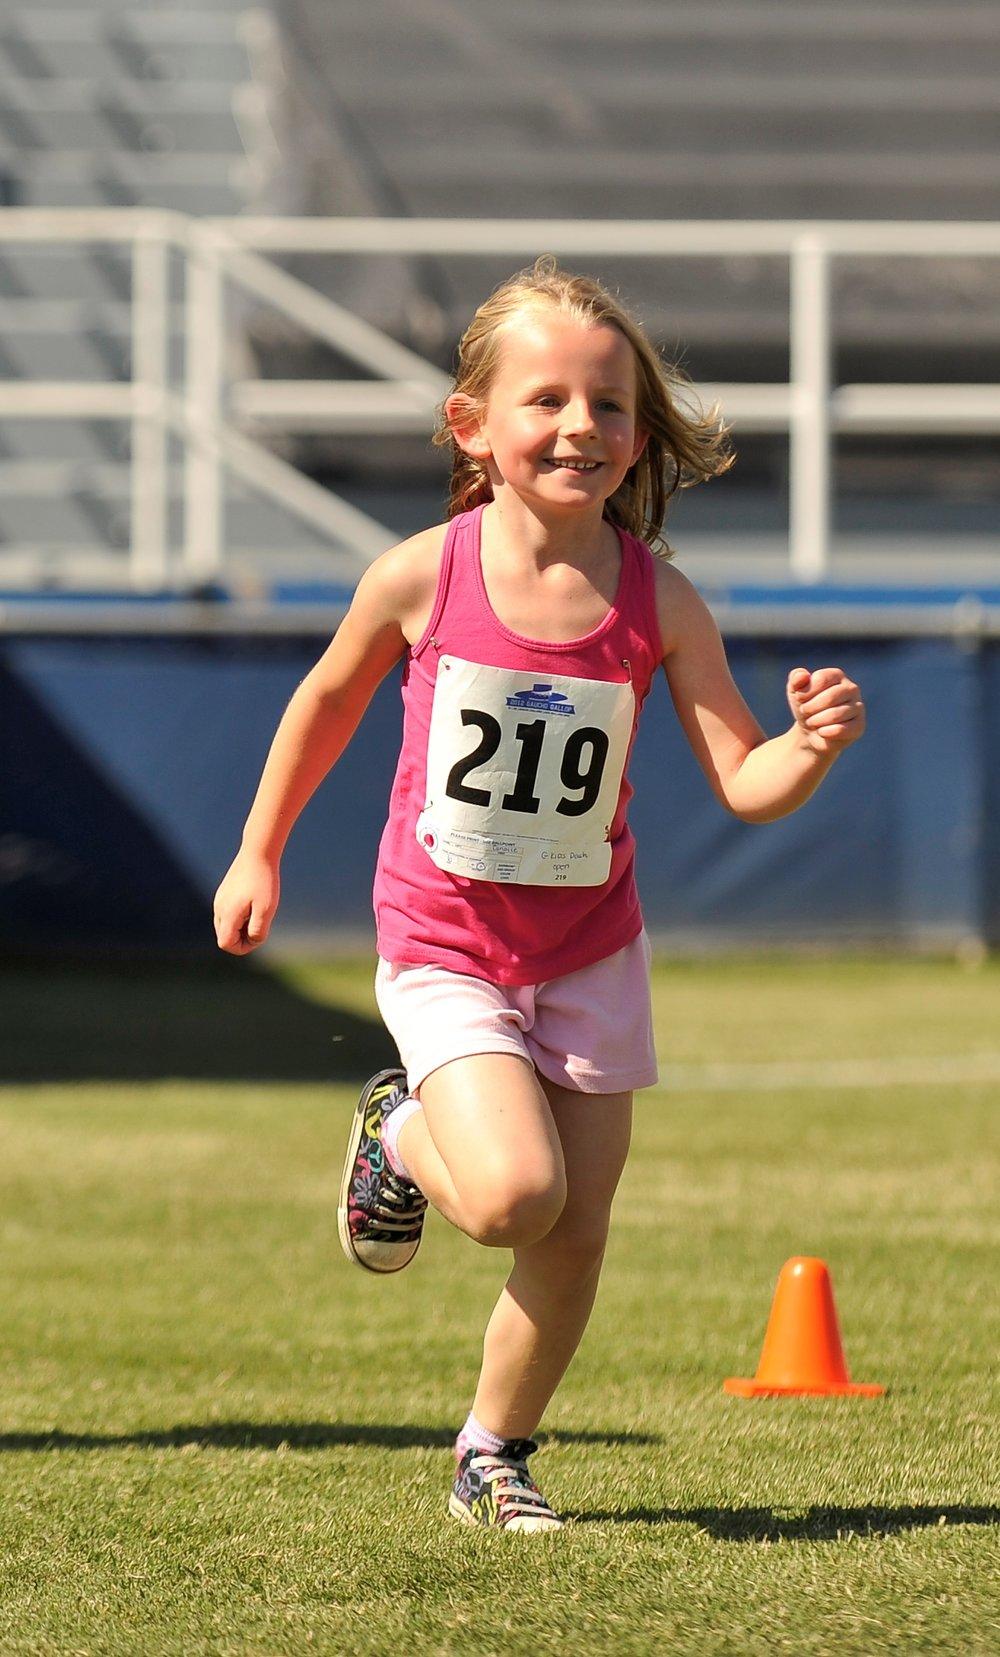 Kids Running Gallop.jpg